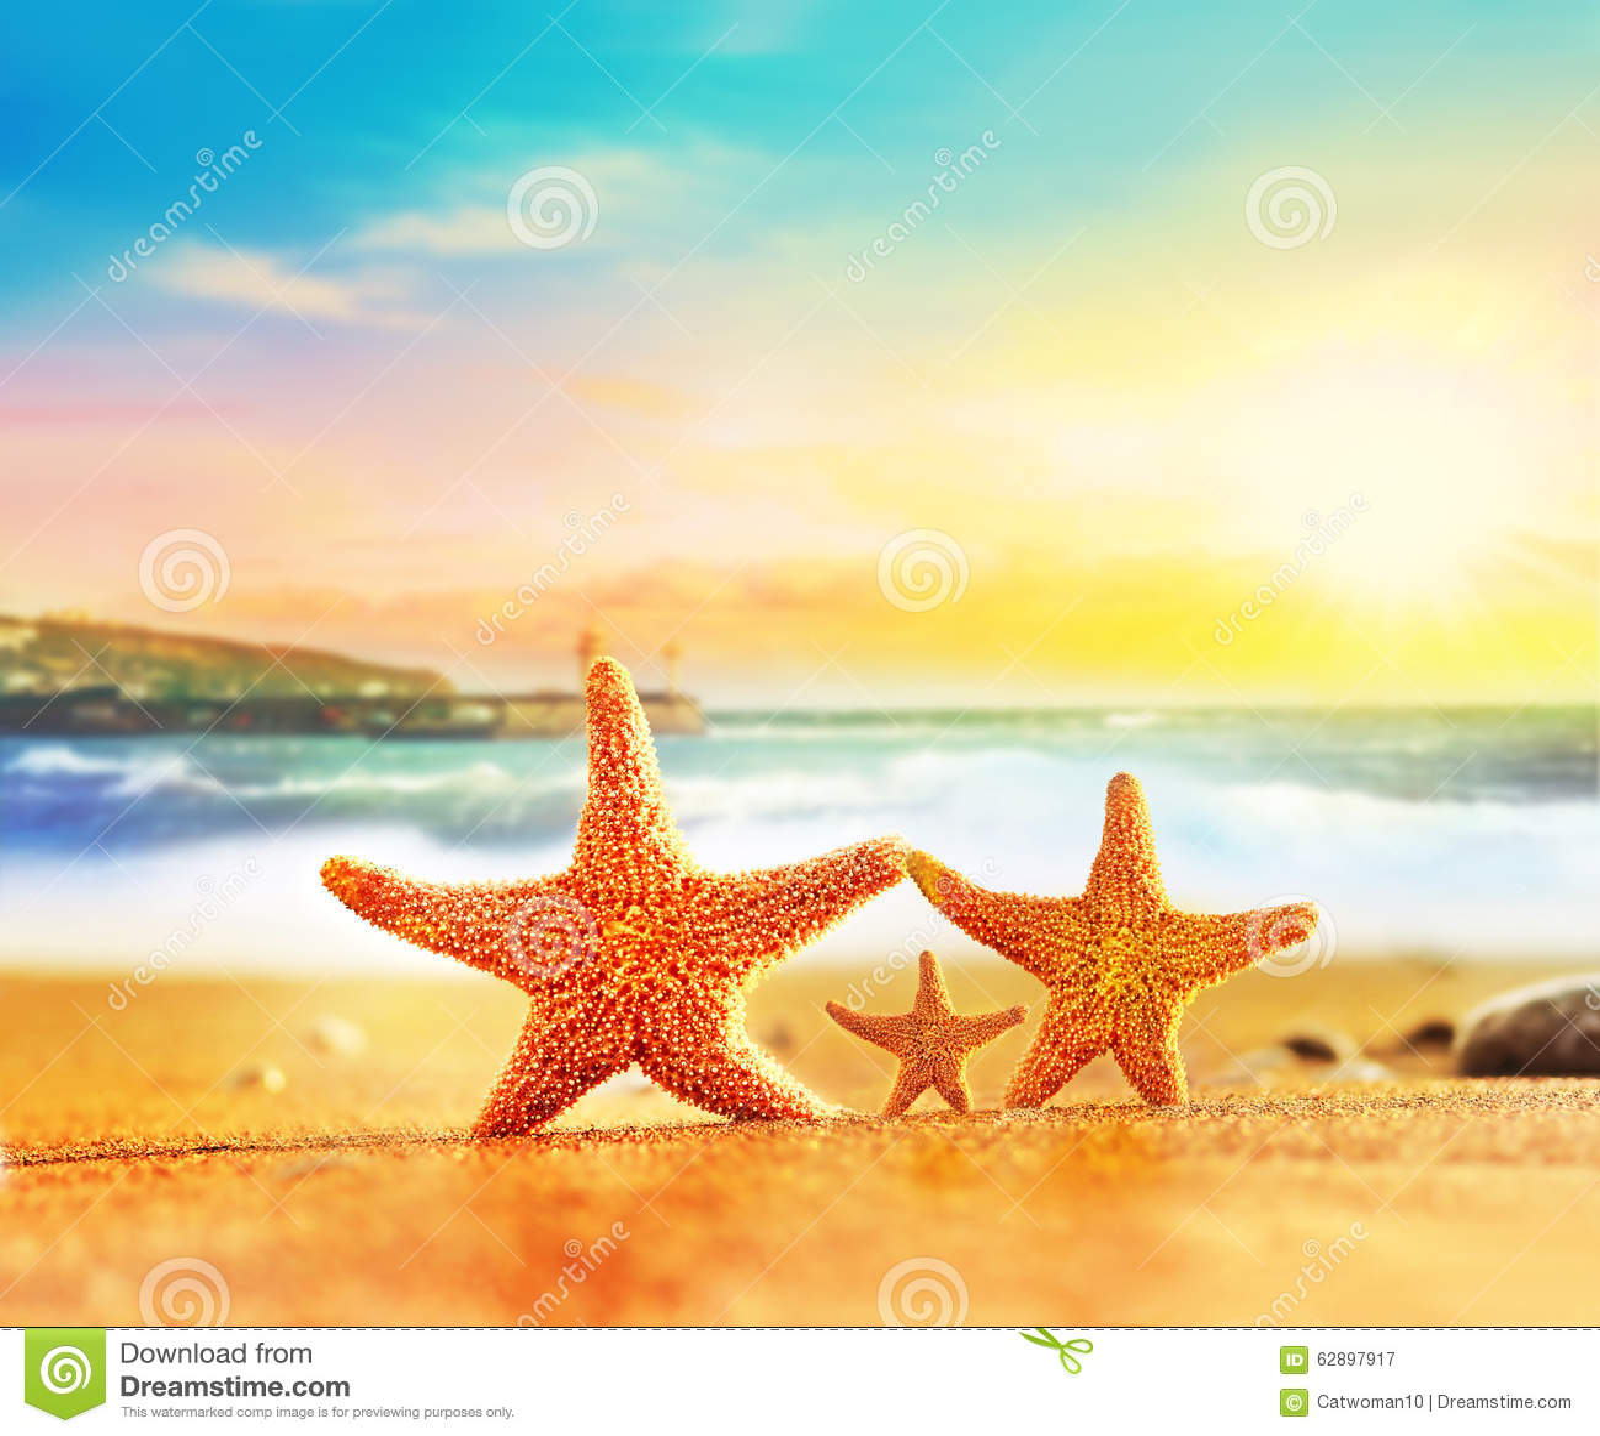 Family starfish on yellow sand near the sea